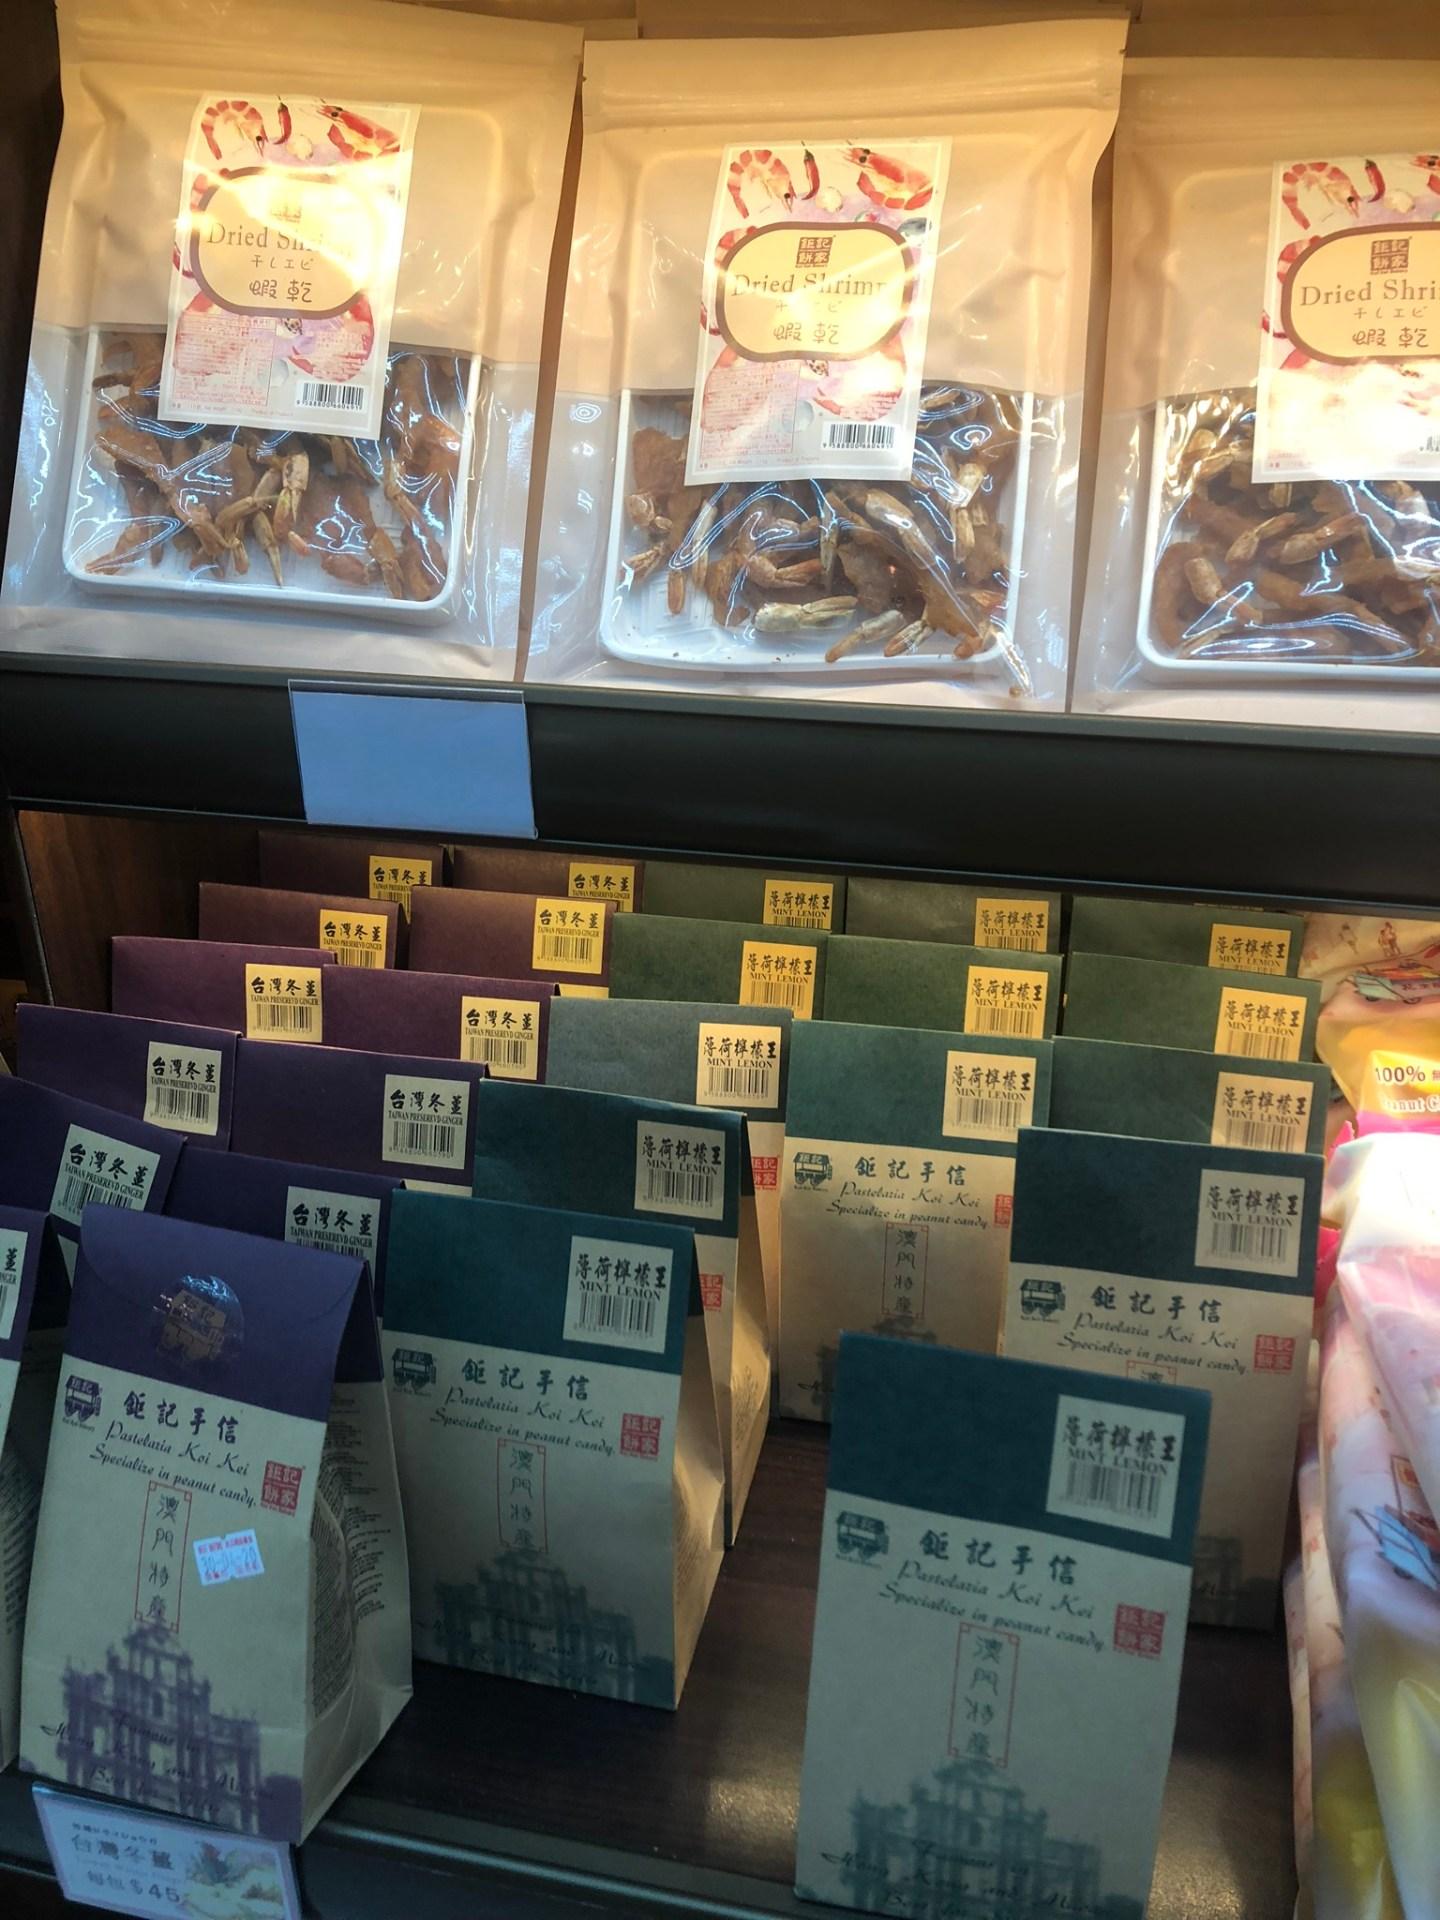 Portuguese treats for sale in Macao